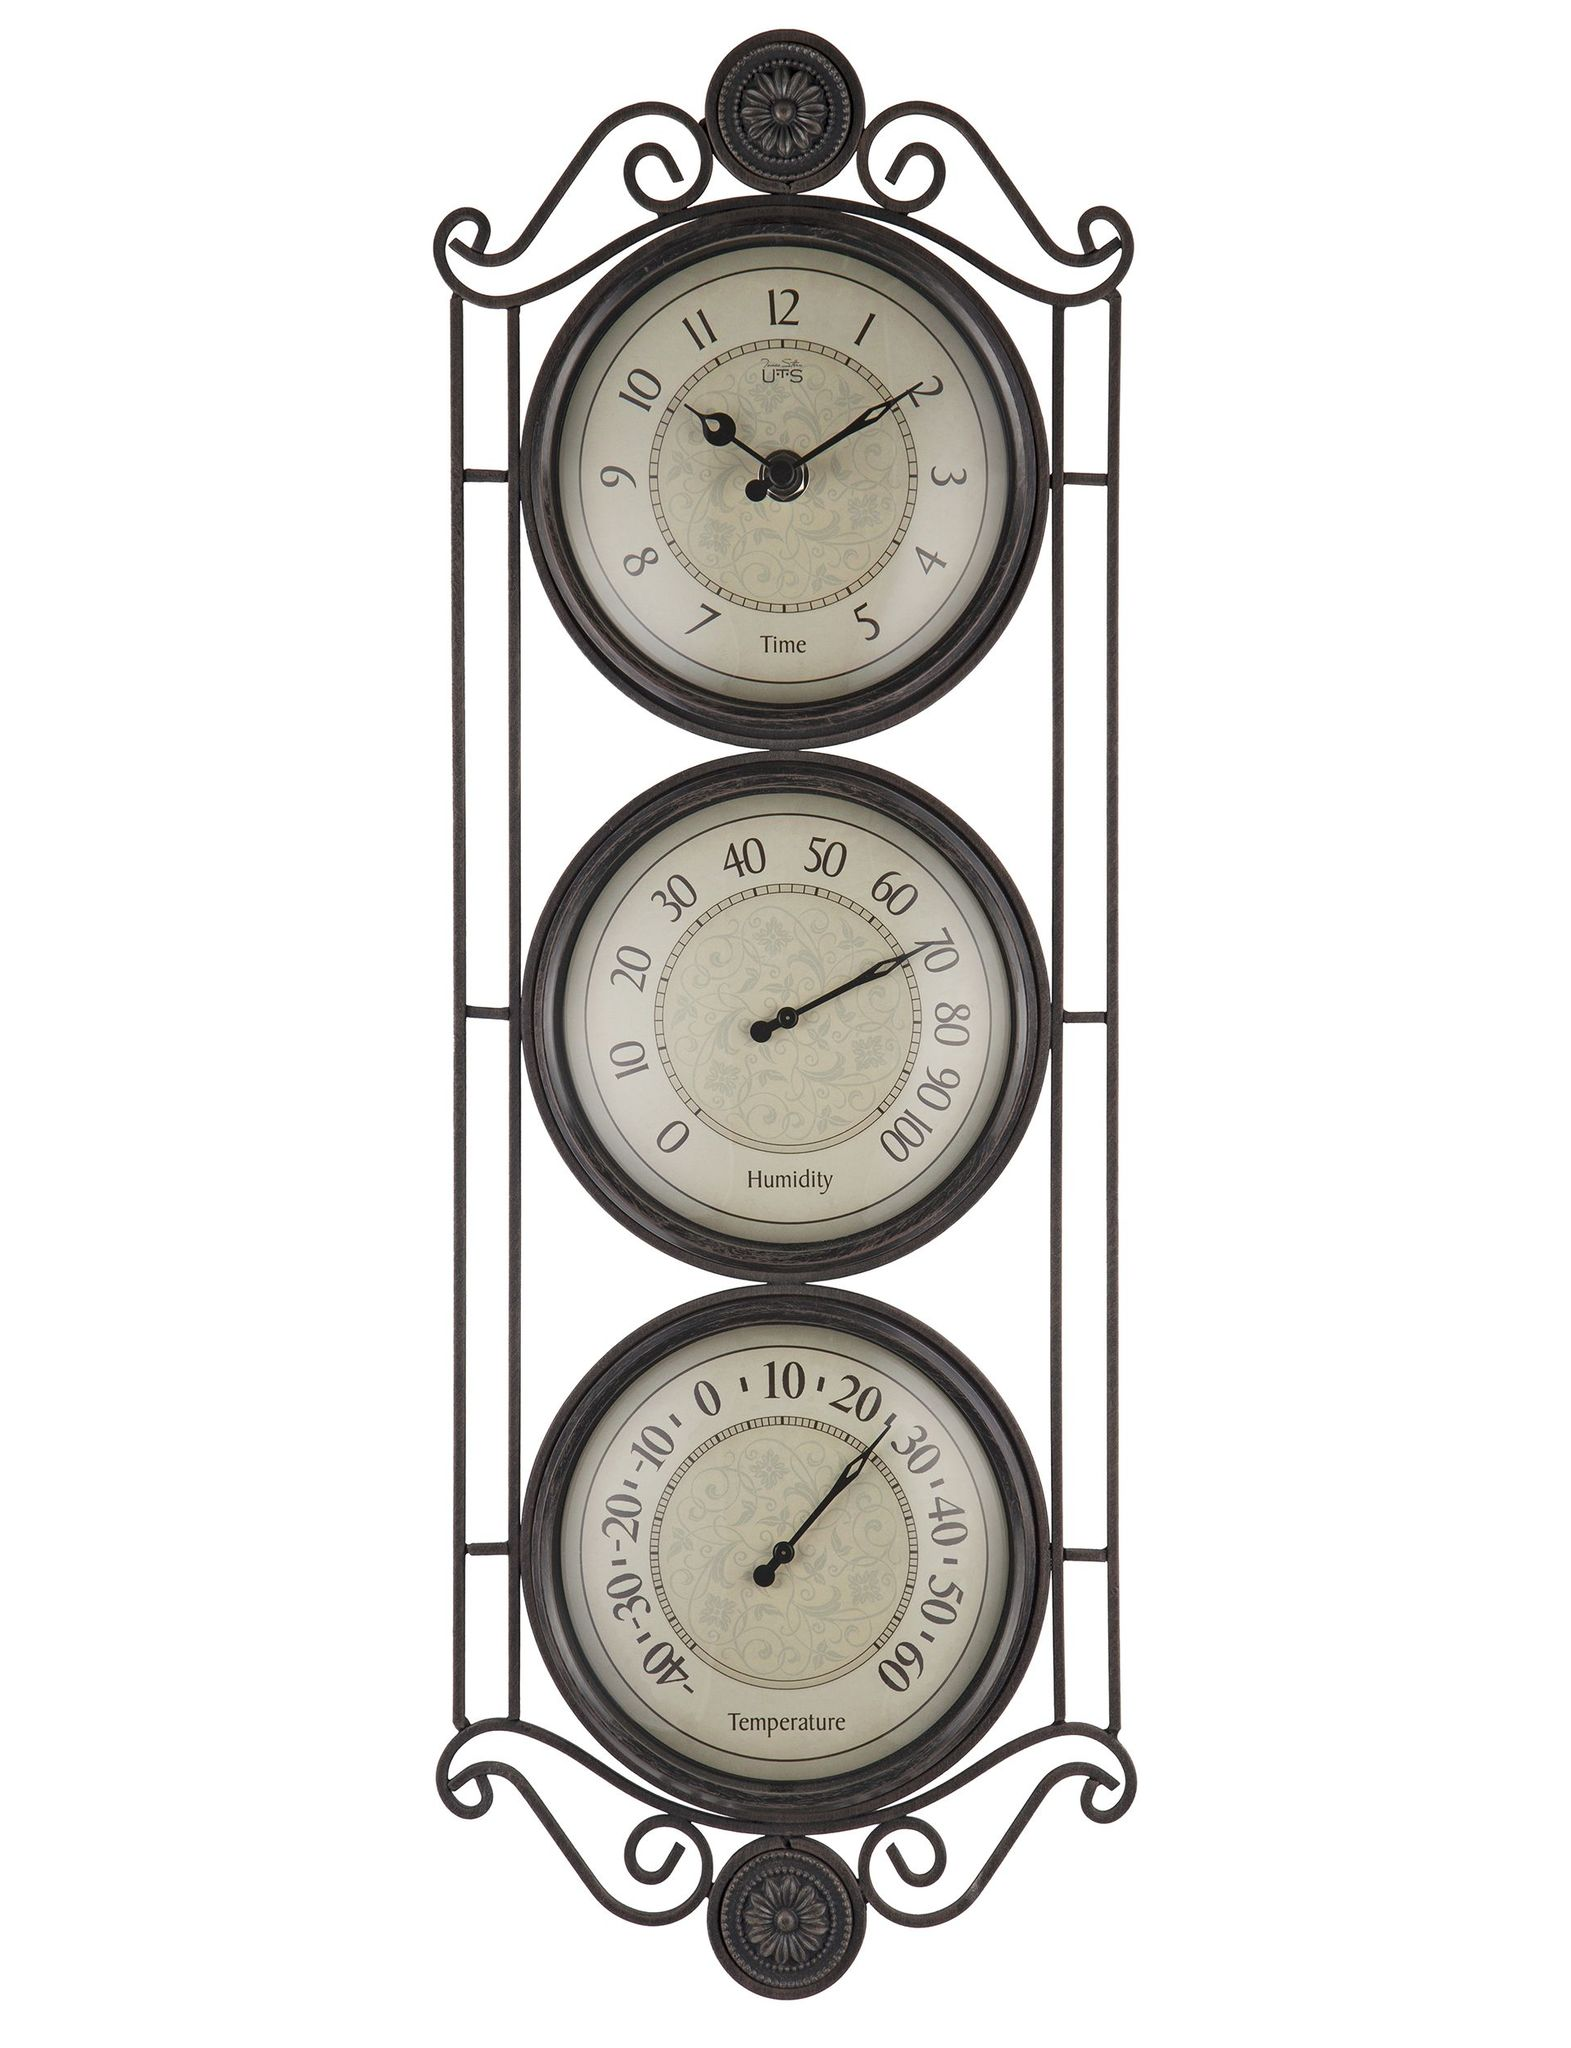 Часы настенные Часы настенные-метеостанция Tomas Stern 9040 chasy-nastennye-tomas-stern-9040-germaniya.jpg